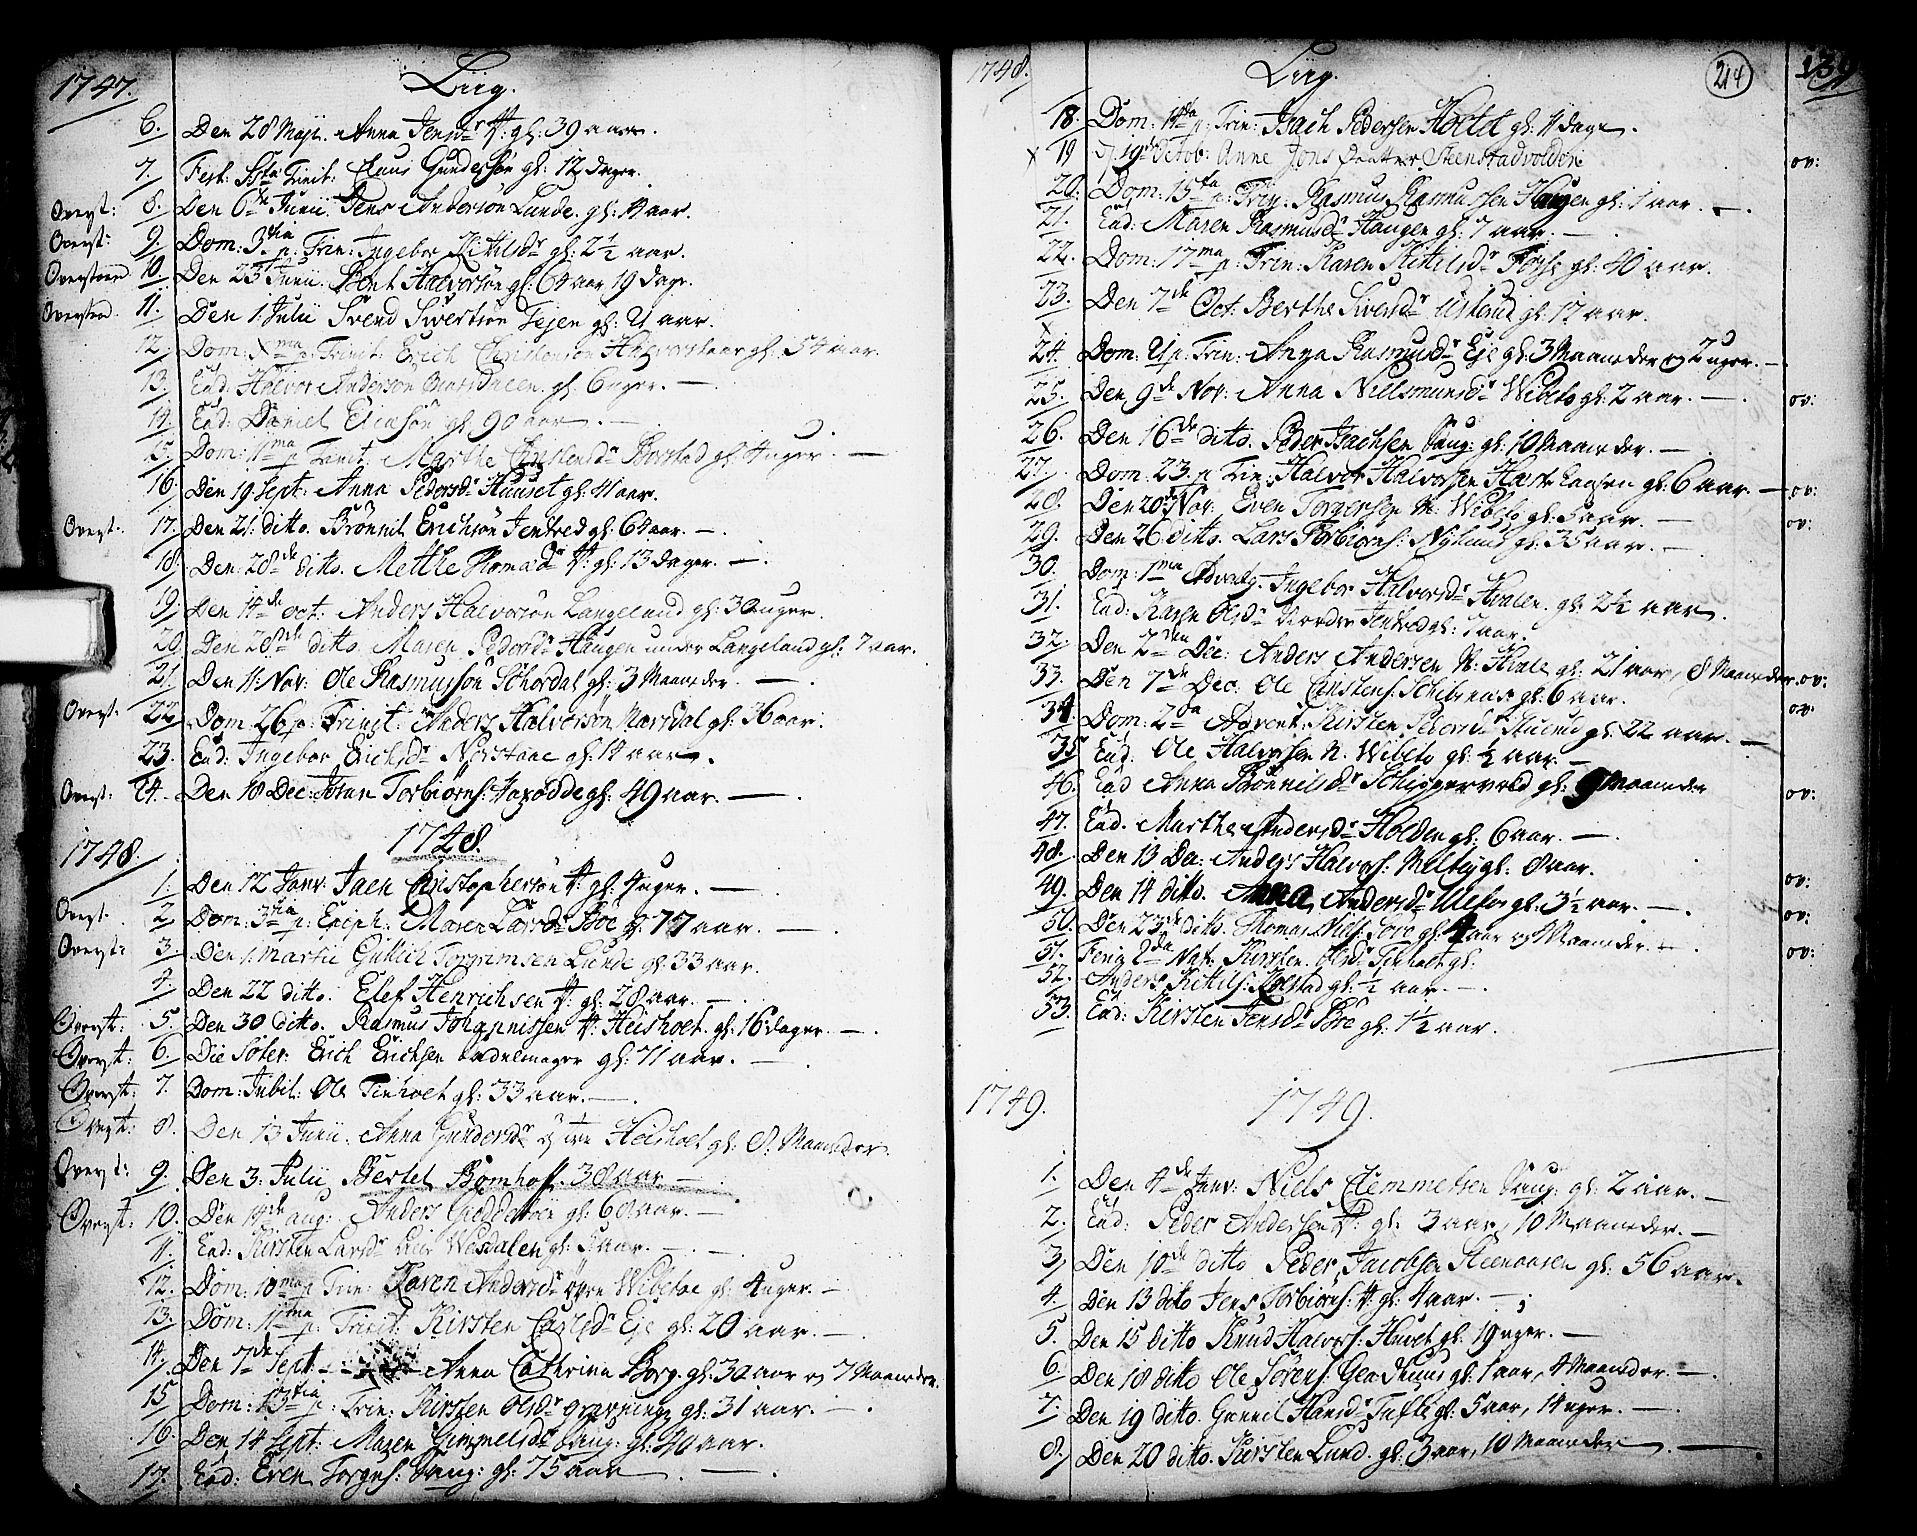 SAKO, Holla kirkebøker, F/Fa/L0001: Ministerialbok nr. 1, 1717-1779, s. 214